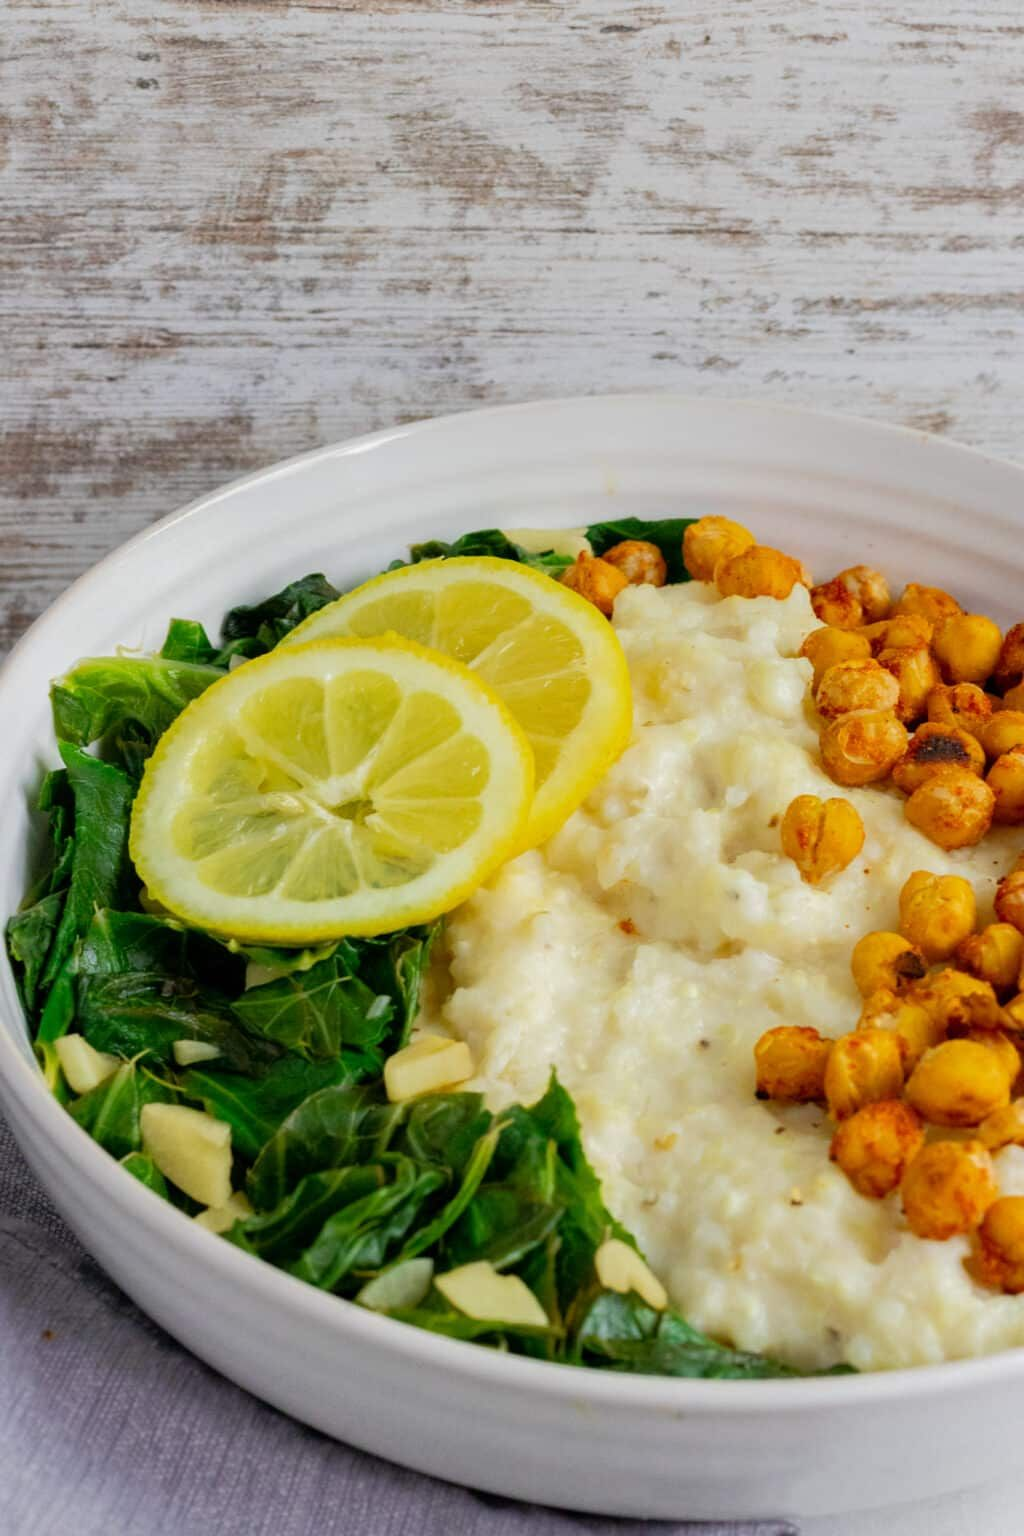 Vegan Cheesy Grits Breakfast Bowl With Crispy Chickpeas Recipe In 2020 Crispy Chickpeas Breakfast Bowls Chickpea